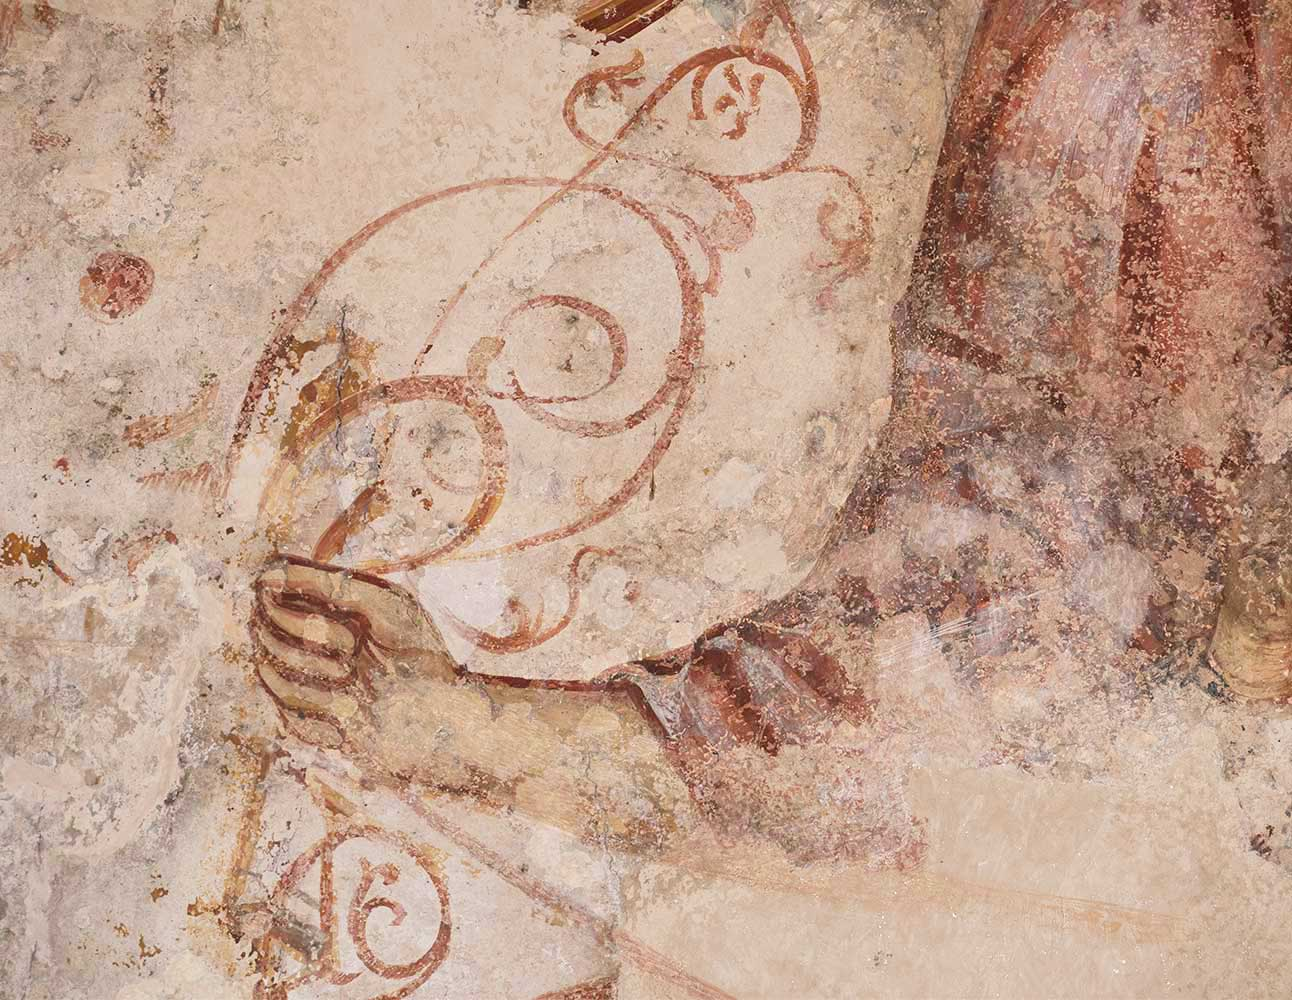 monastere-abu-gosh-sein-abraham-detail2